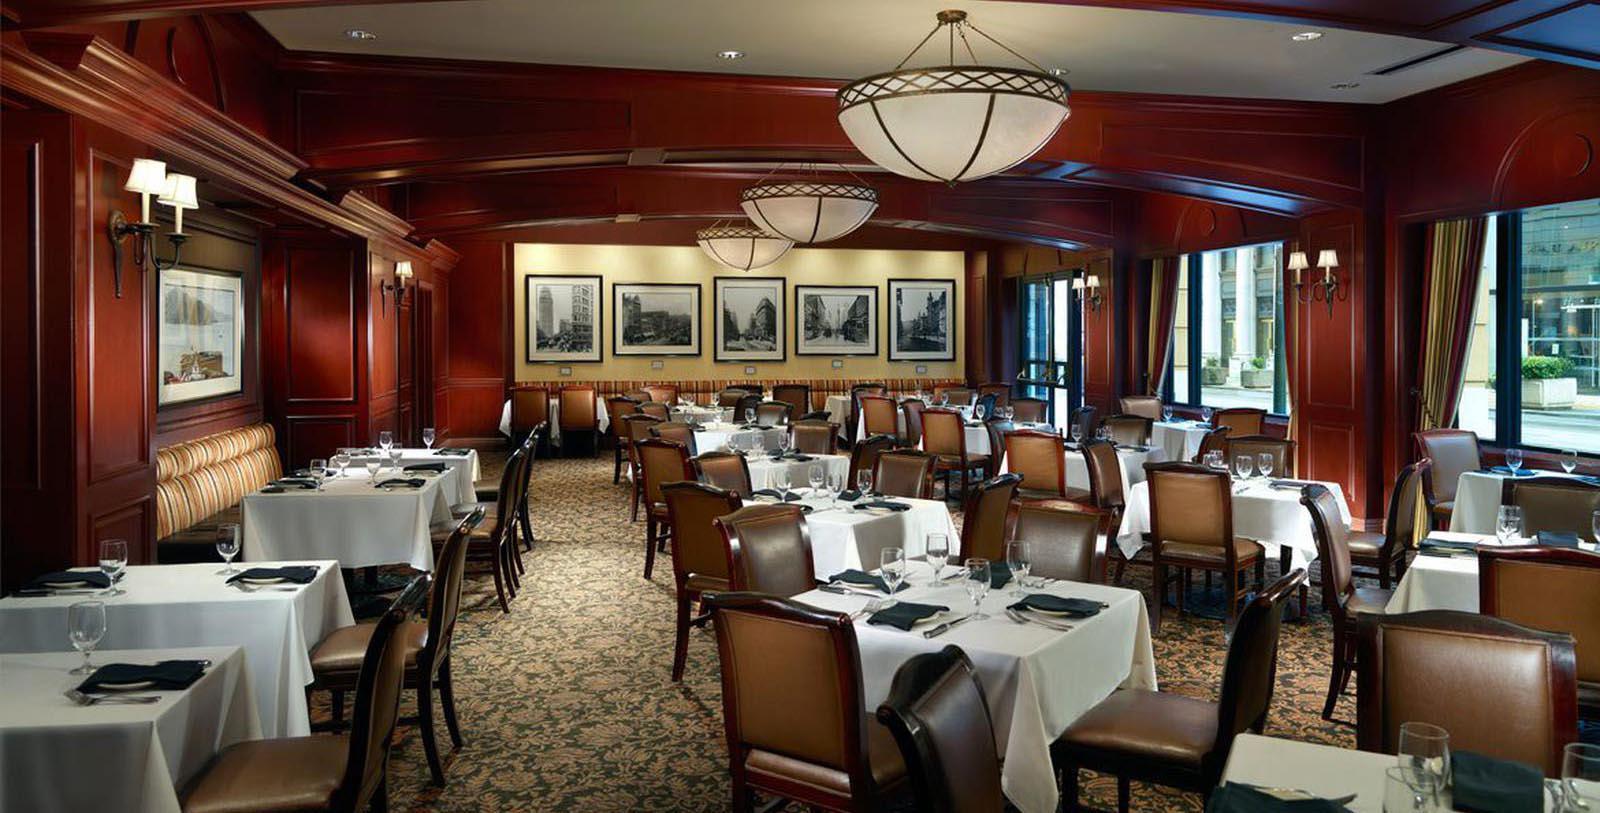 Image of Bob's Steak & Chop House, Omni San Francisco Hotel, California, 1926, Member of Historic Hotels of America, Taste